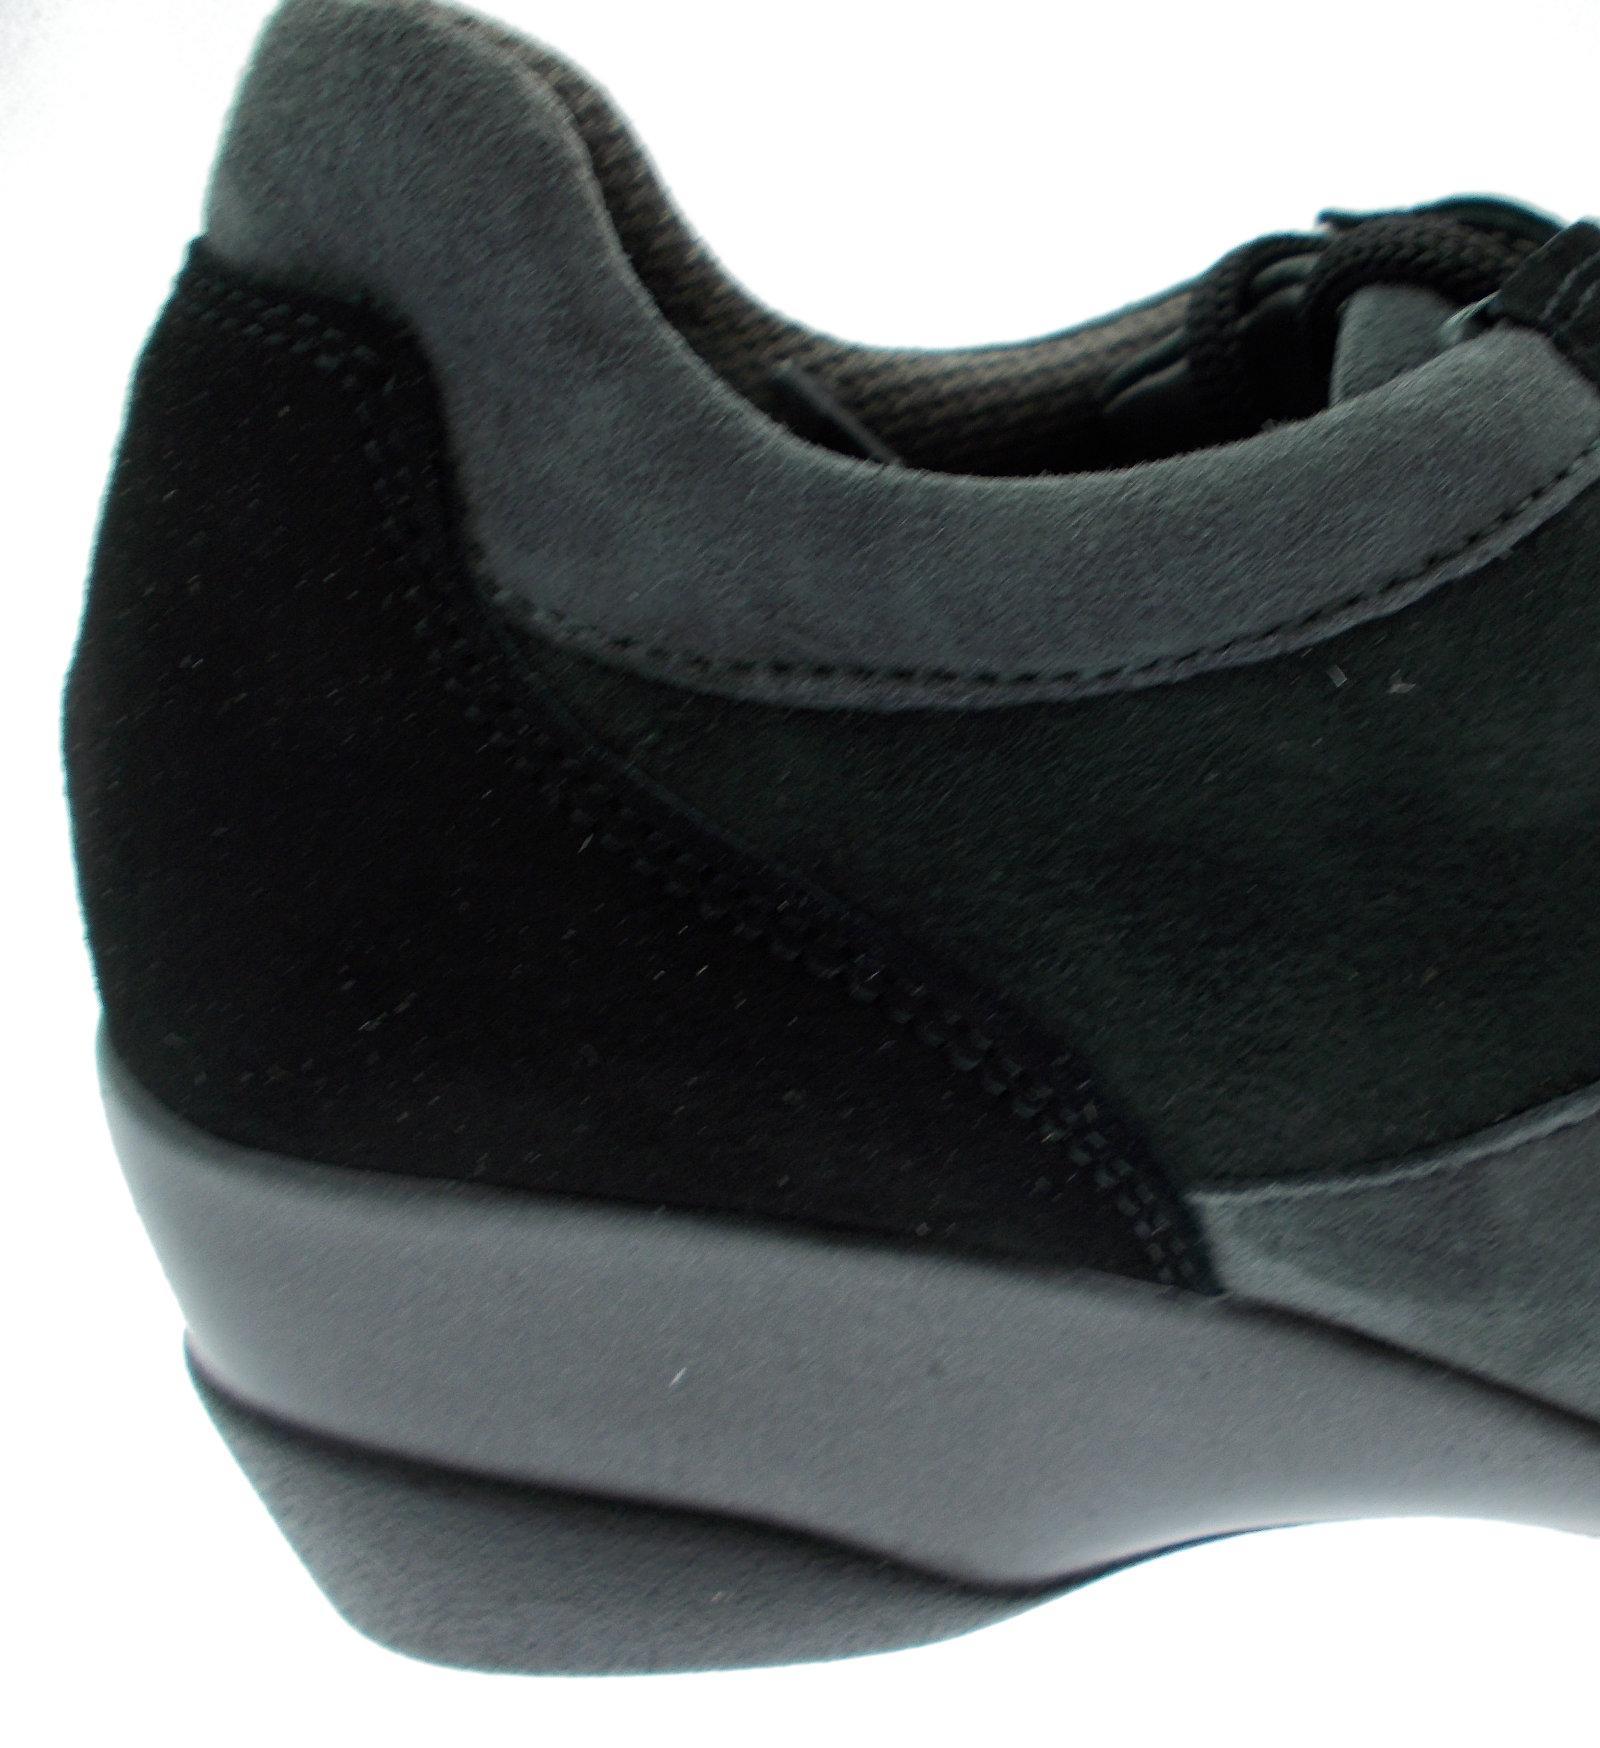 shoe laces r0365 black suede gray wedge melluso